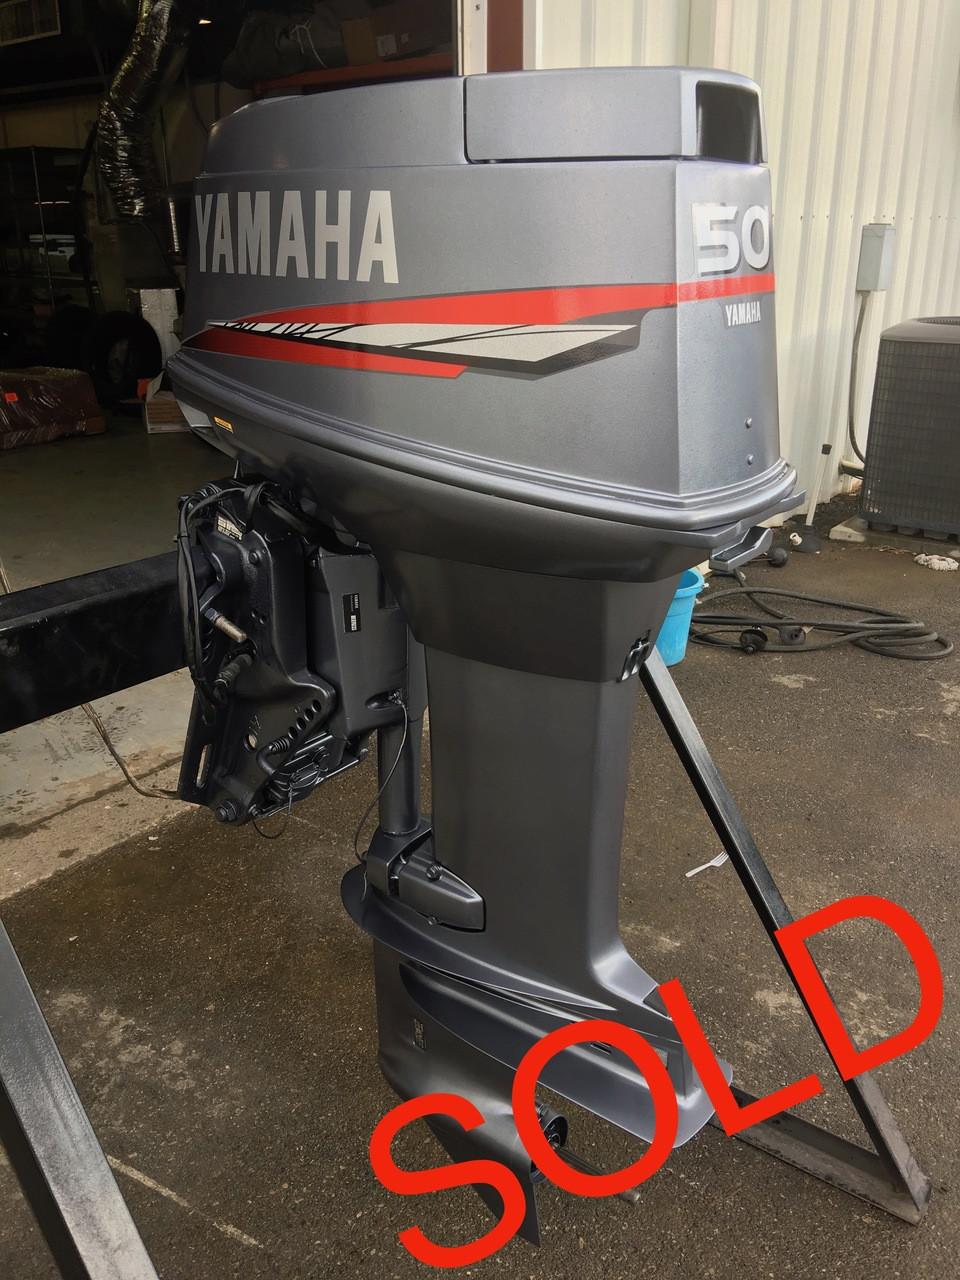 2000 Yamaha 50 HP 3 Cylinder Carbureted 2 Stroke 20